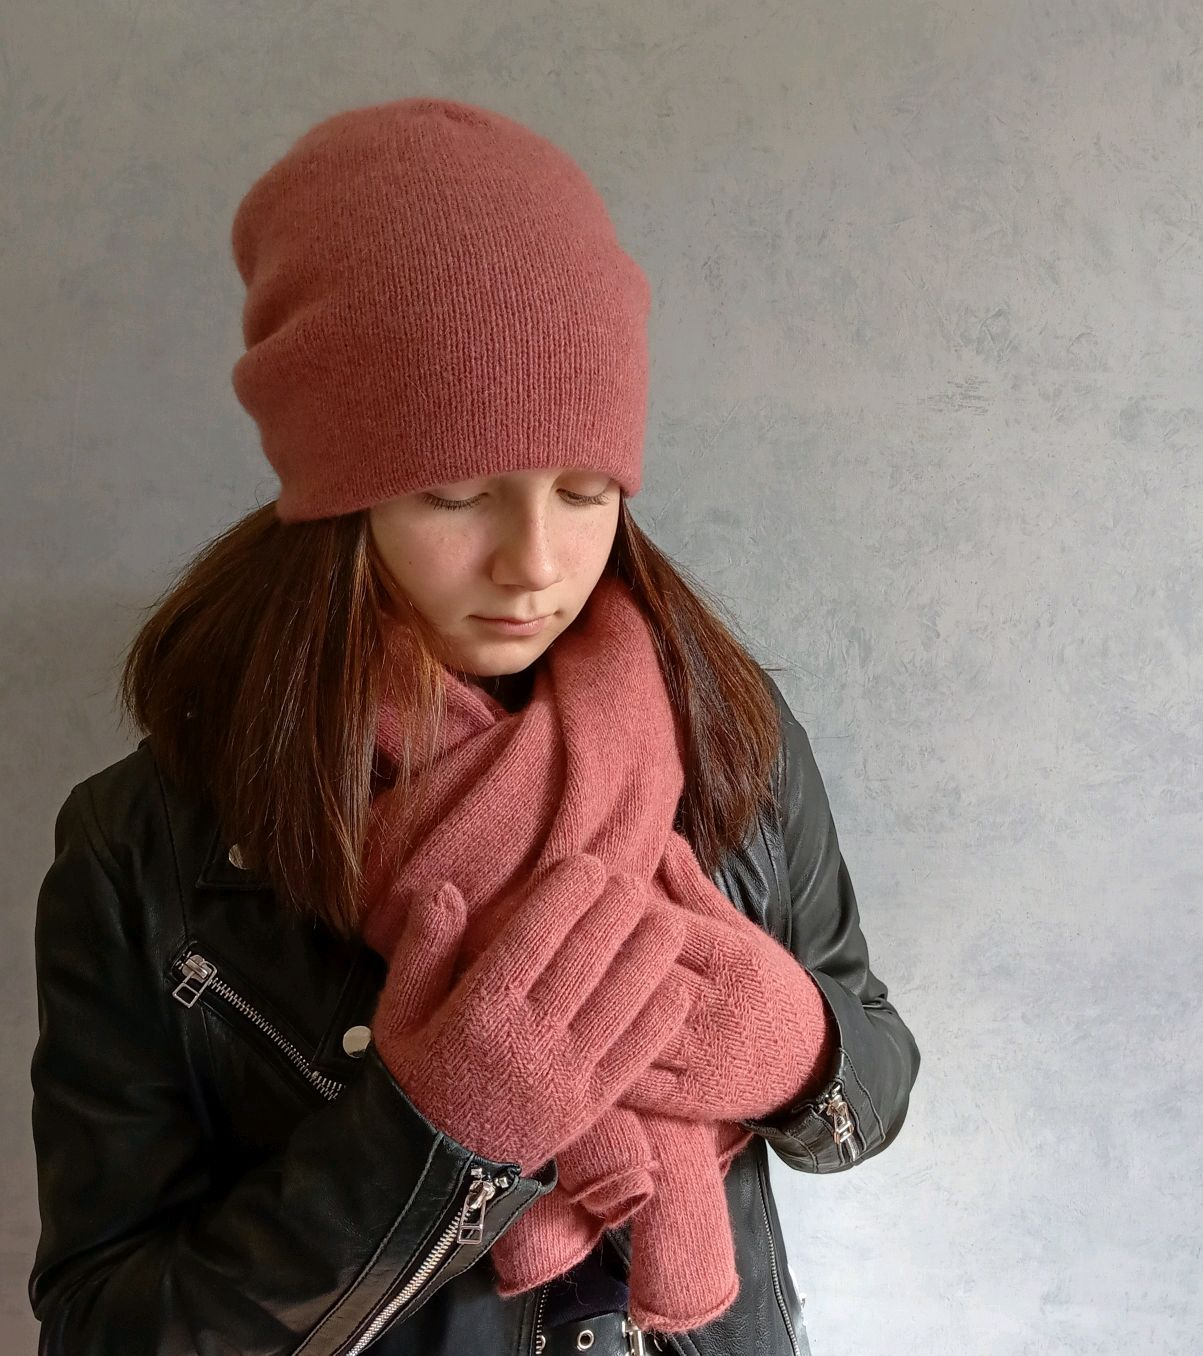 Комплект-шарф-палантин, двойная шапочка бини и перчатки, Шапки, Балашиха,  Фото №1